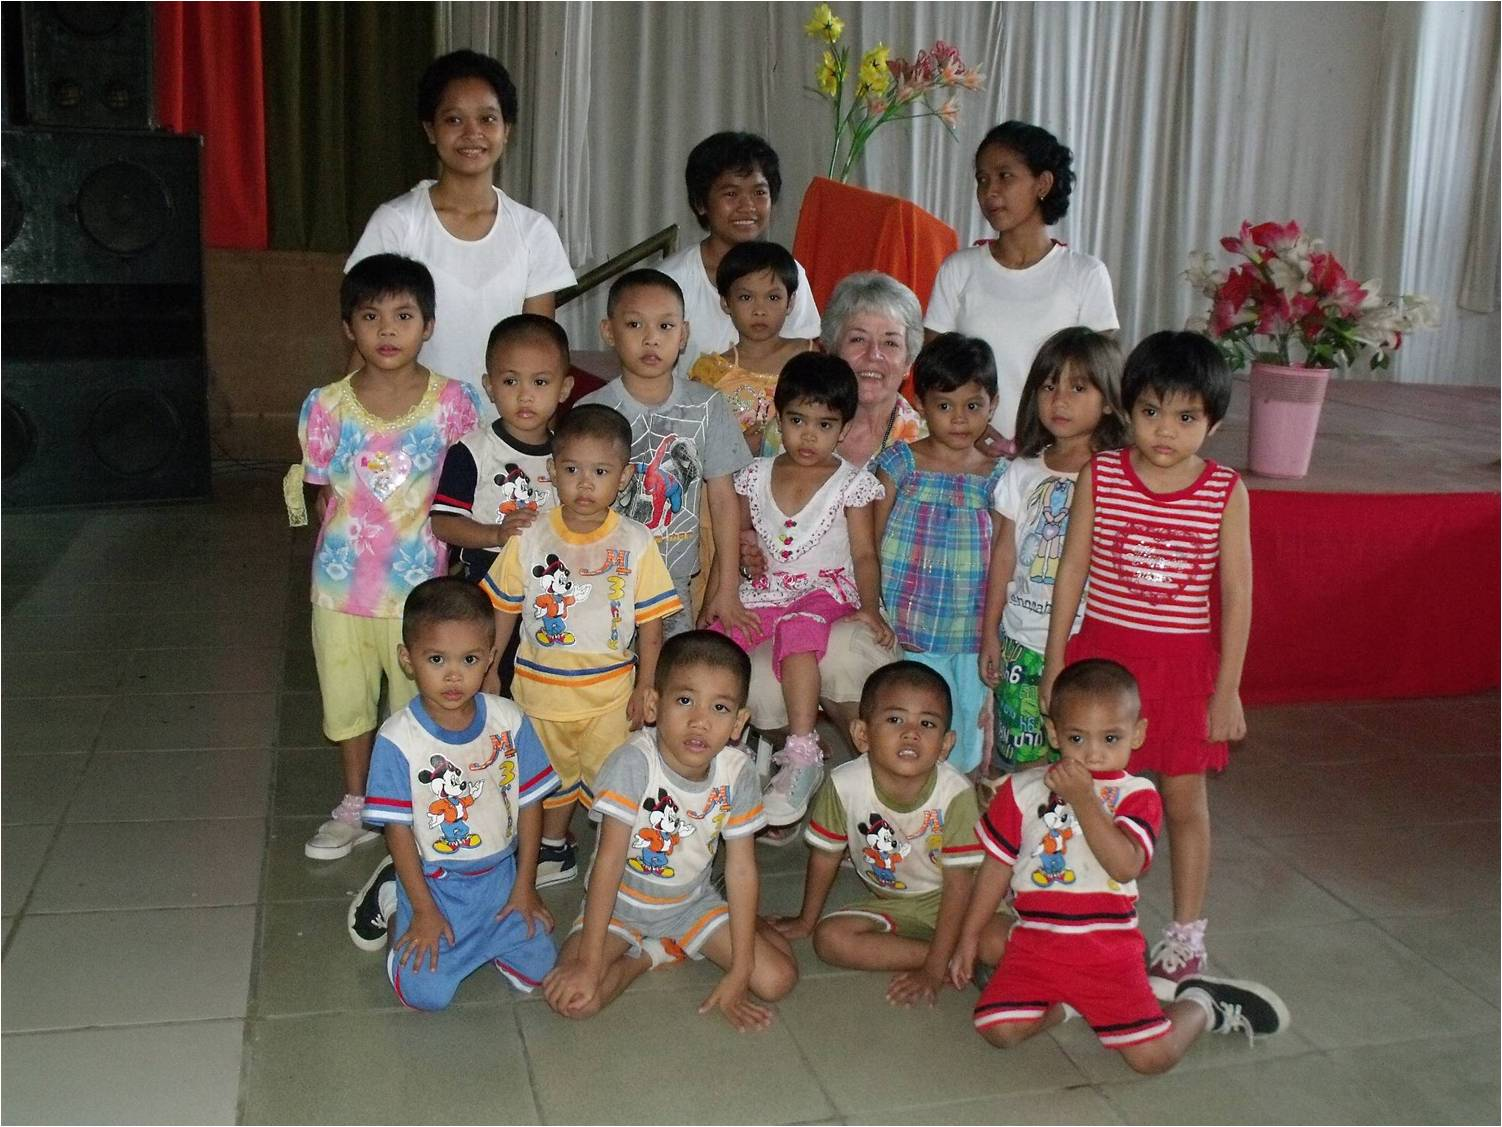 FWB Children\'s Home in Cebu